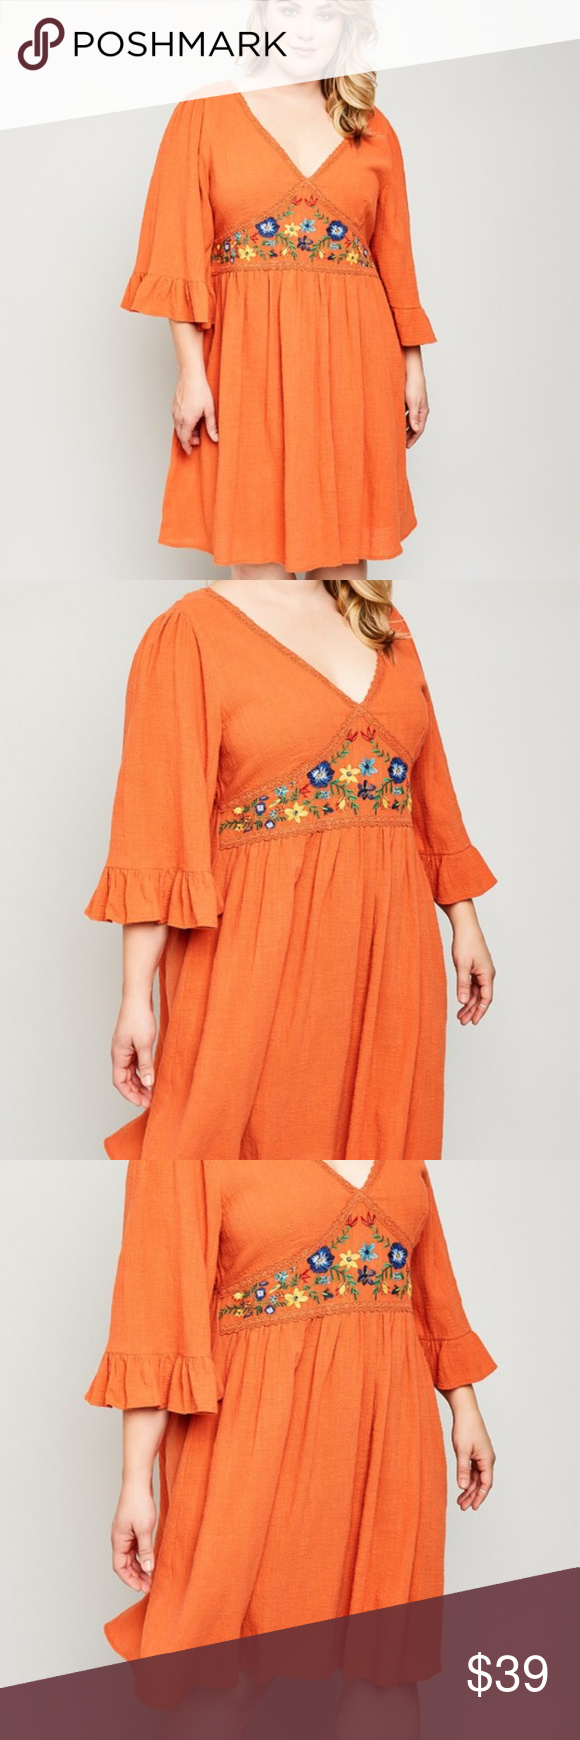 Burnt orange dress plus size  Embroidered Floral Tunic Dress Boutique  My Posh Picks  Pinterest